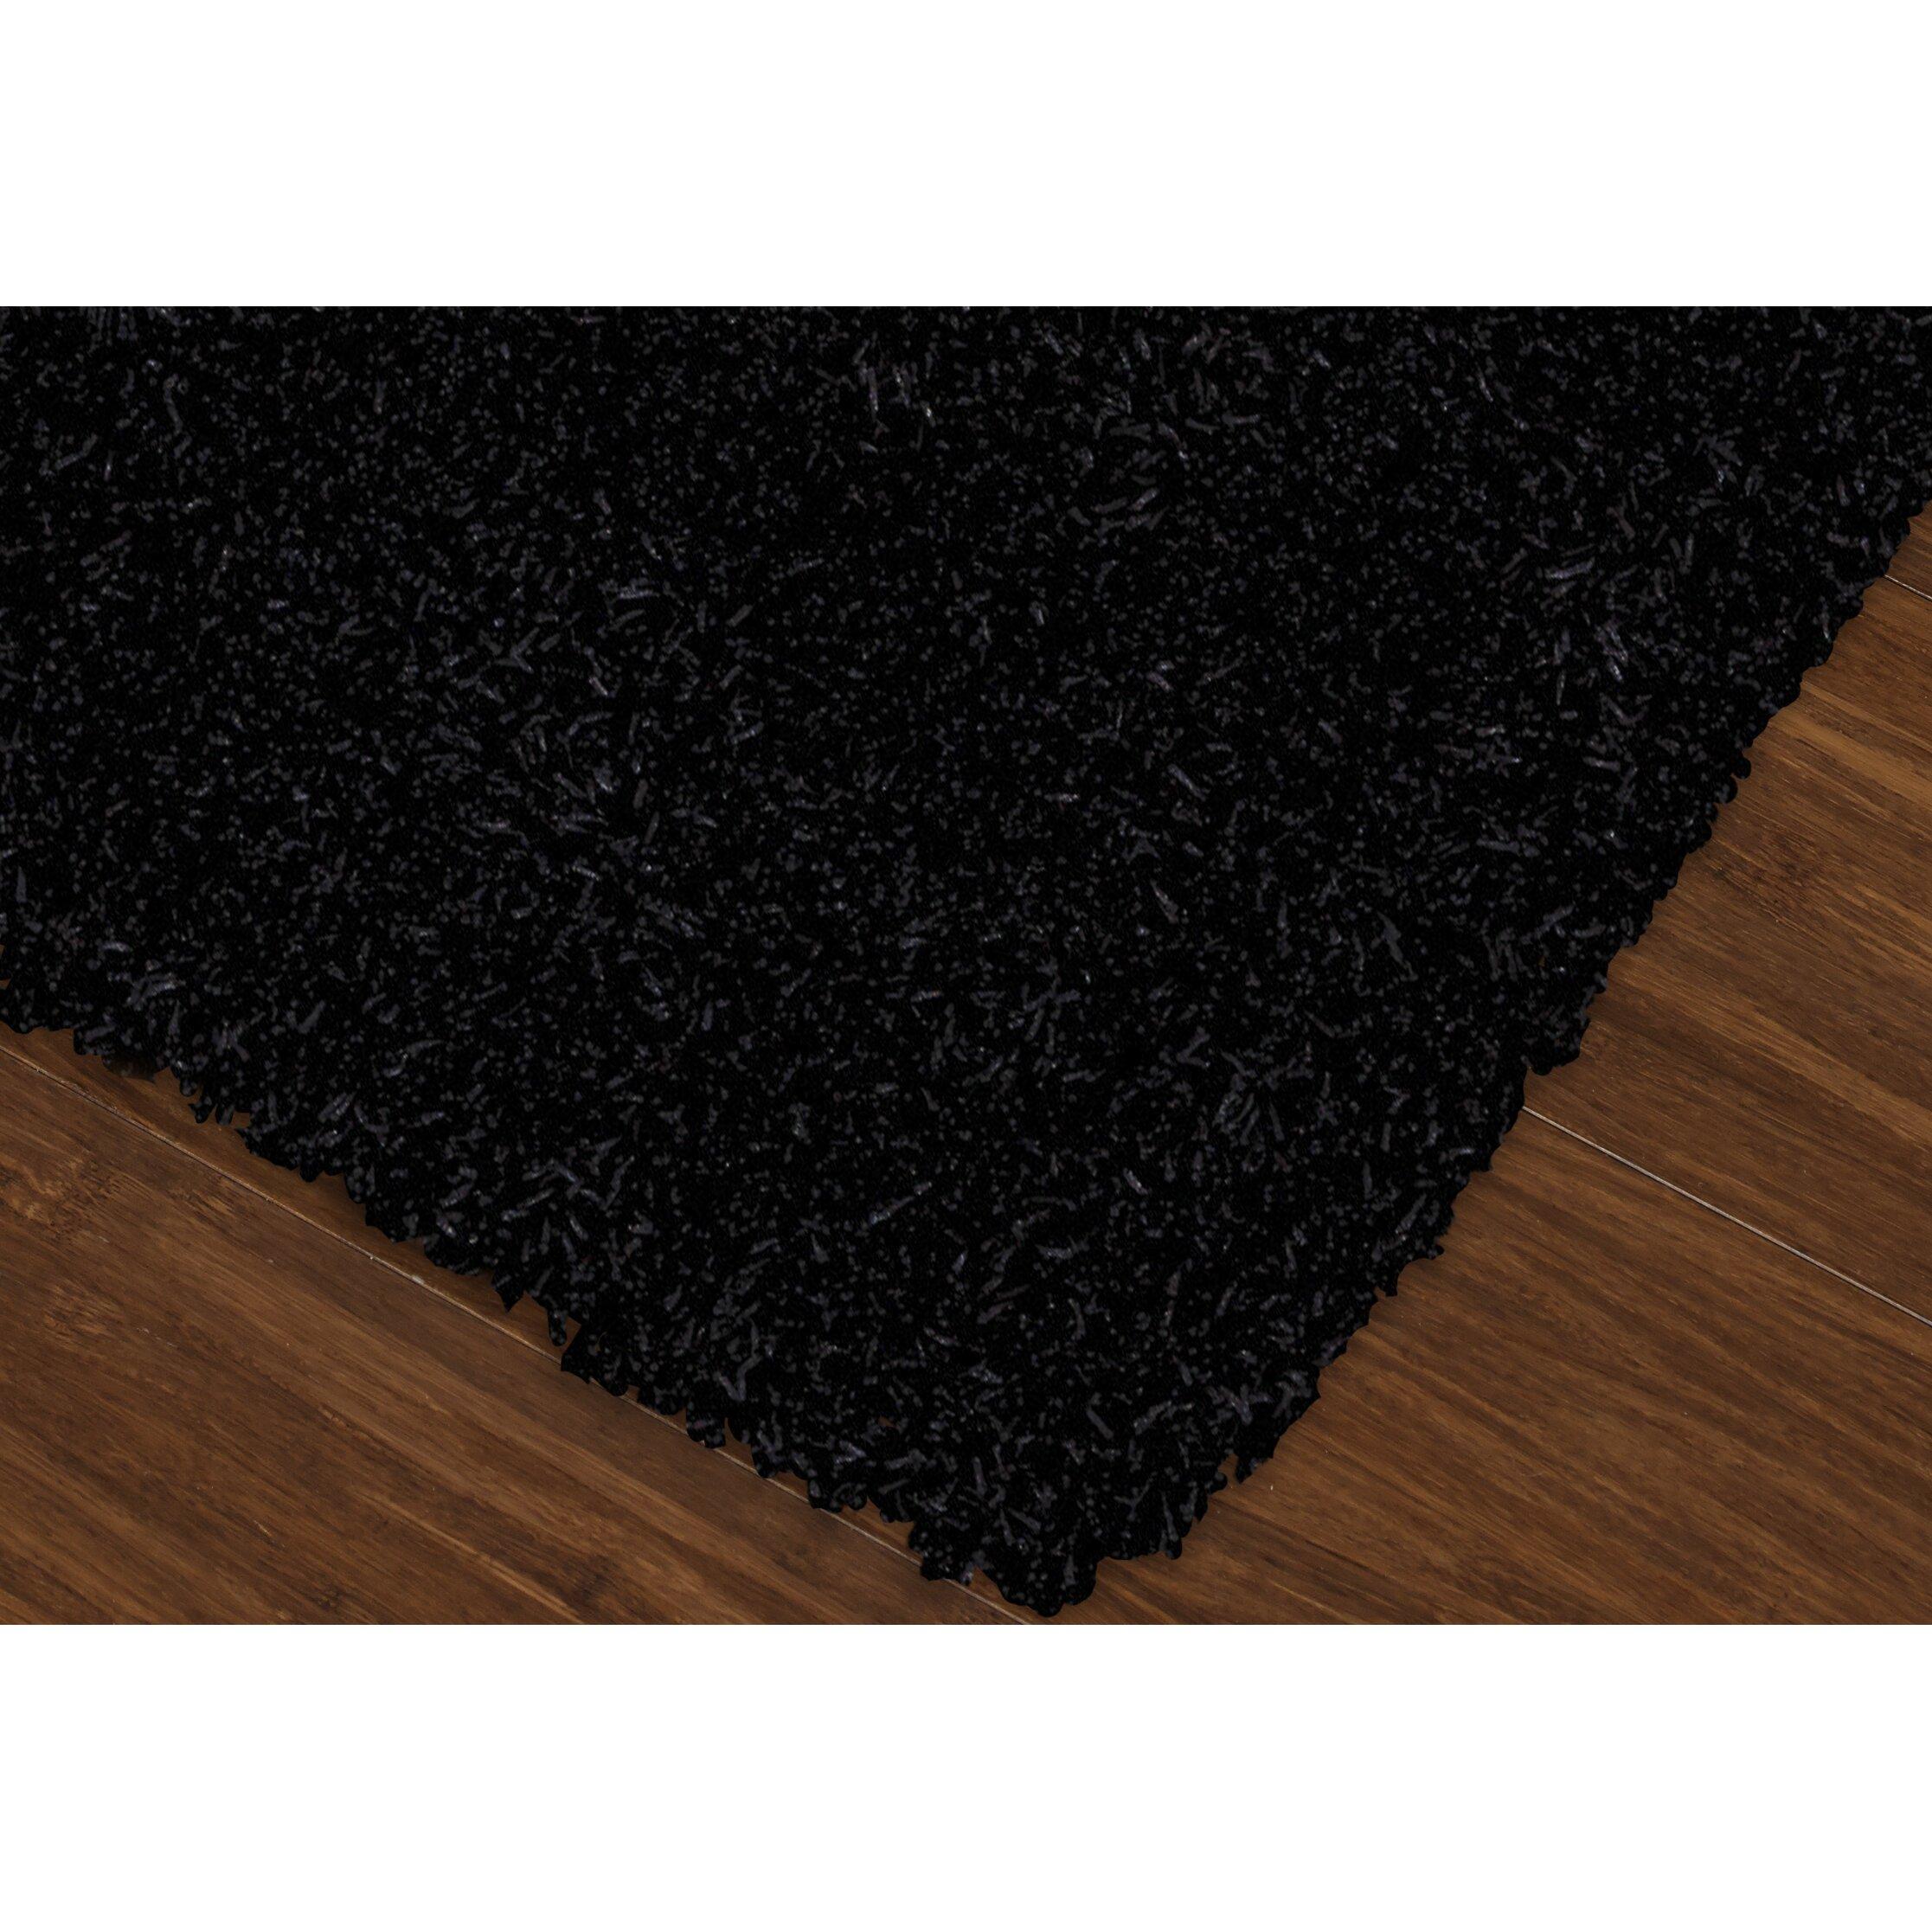 Black Shag Area Rugs Shag Shag 5 Black